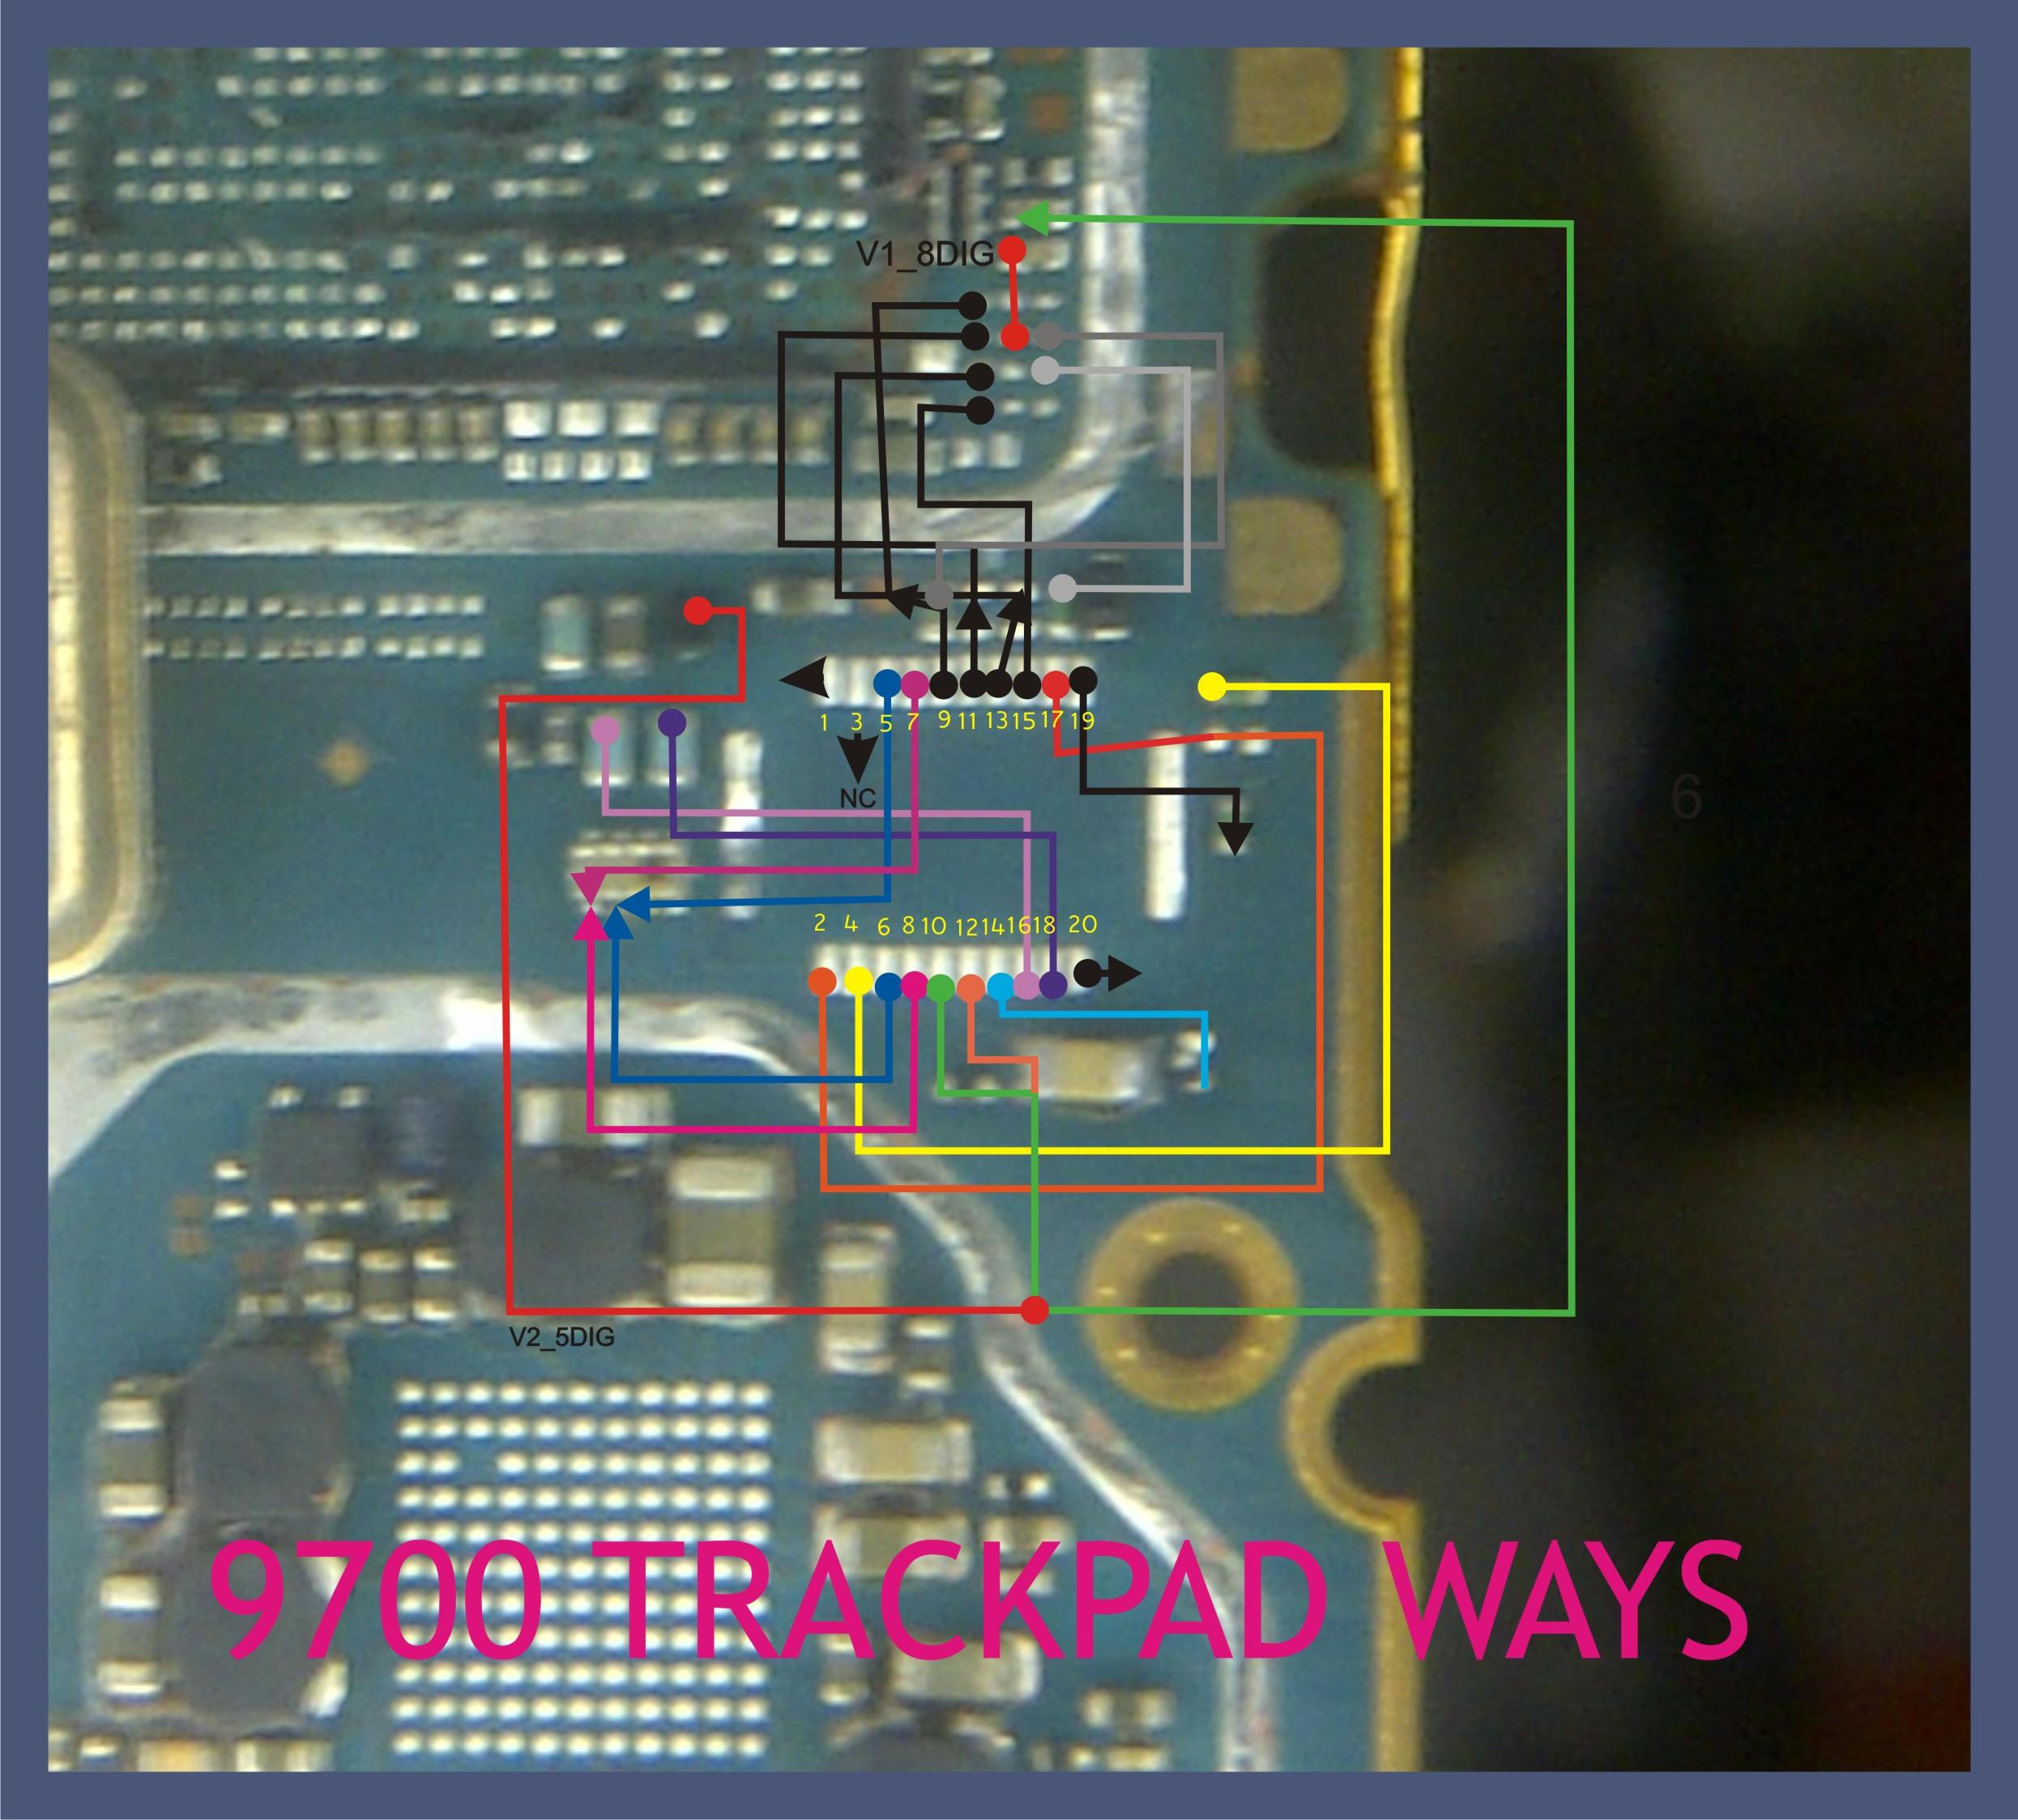 Blackberry 9700 Trackpad Ways